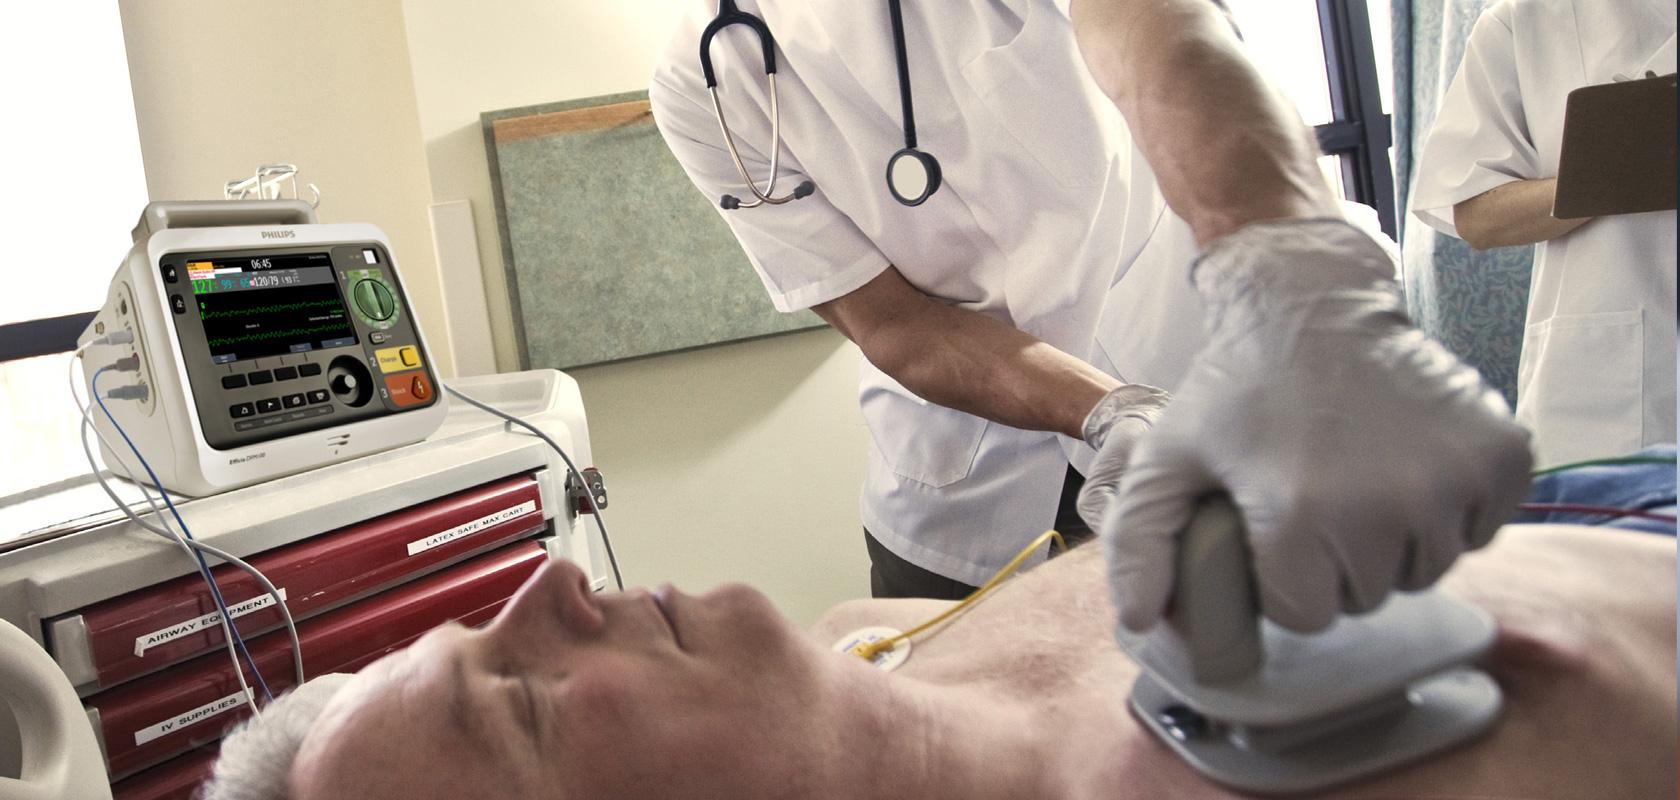 TORBAYTEC :: Medical Equipment, Consumables, Medical